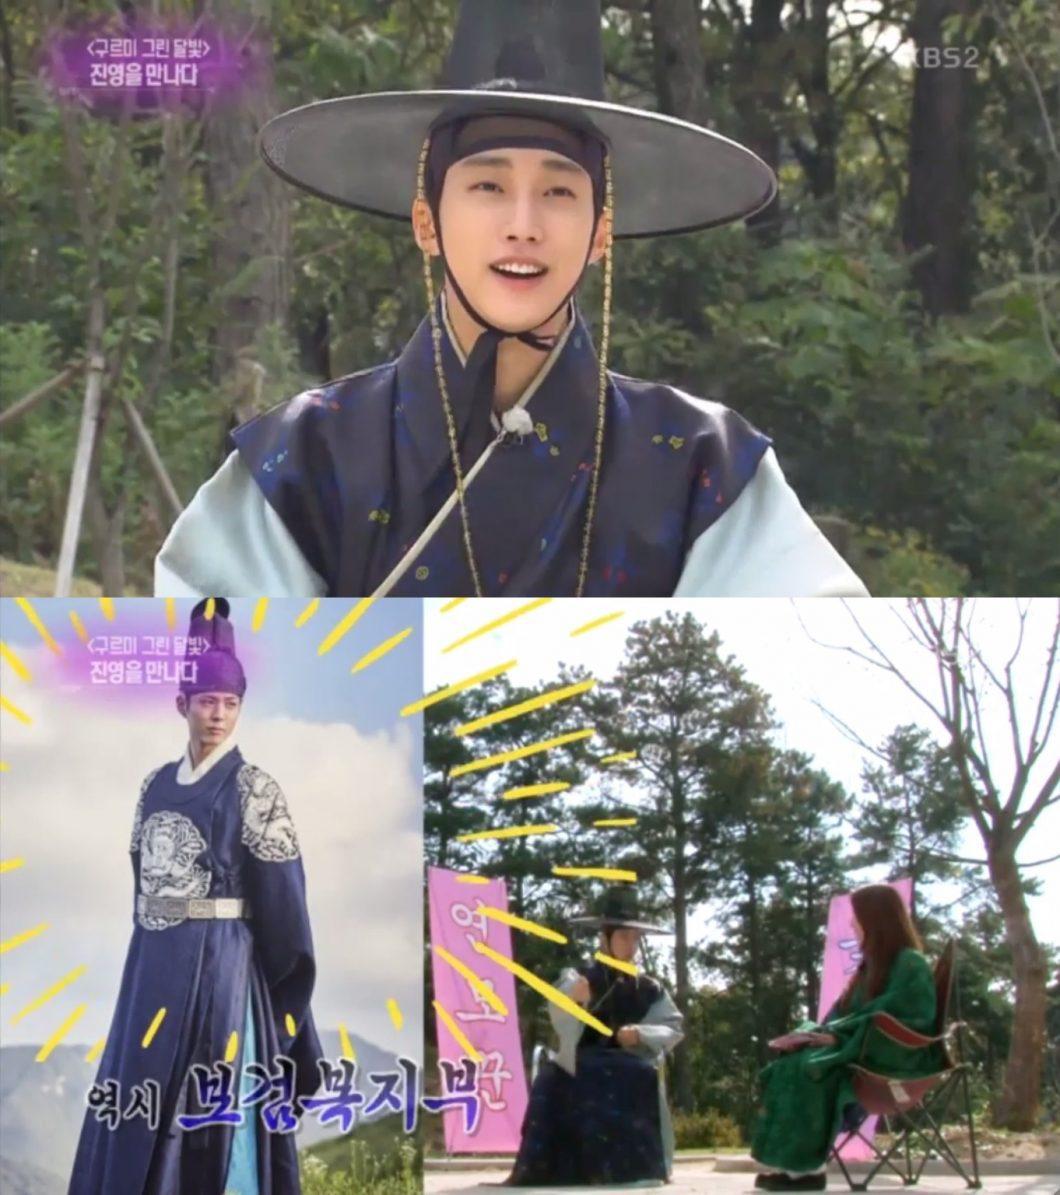 b1a4-jinyoung-park-bo-gum